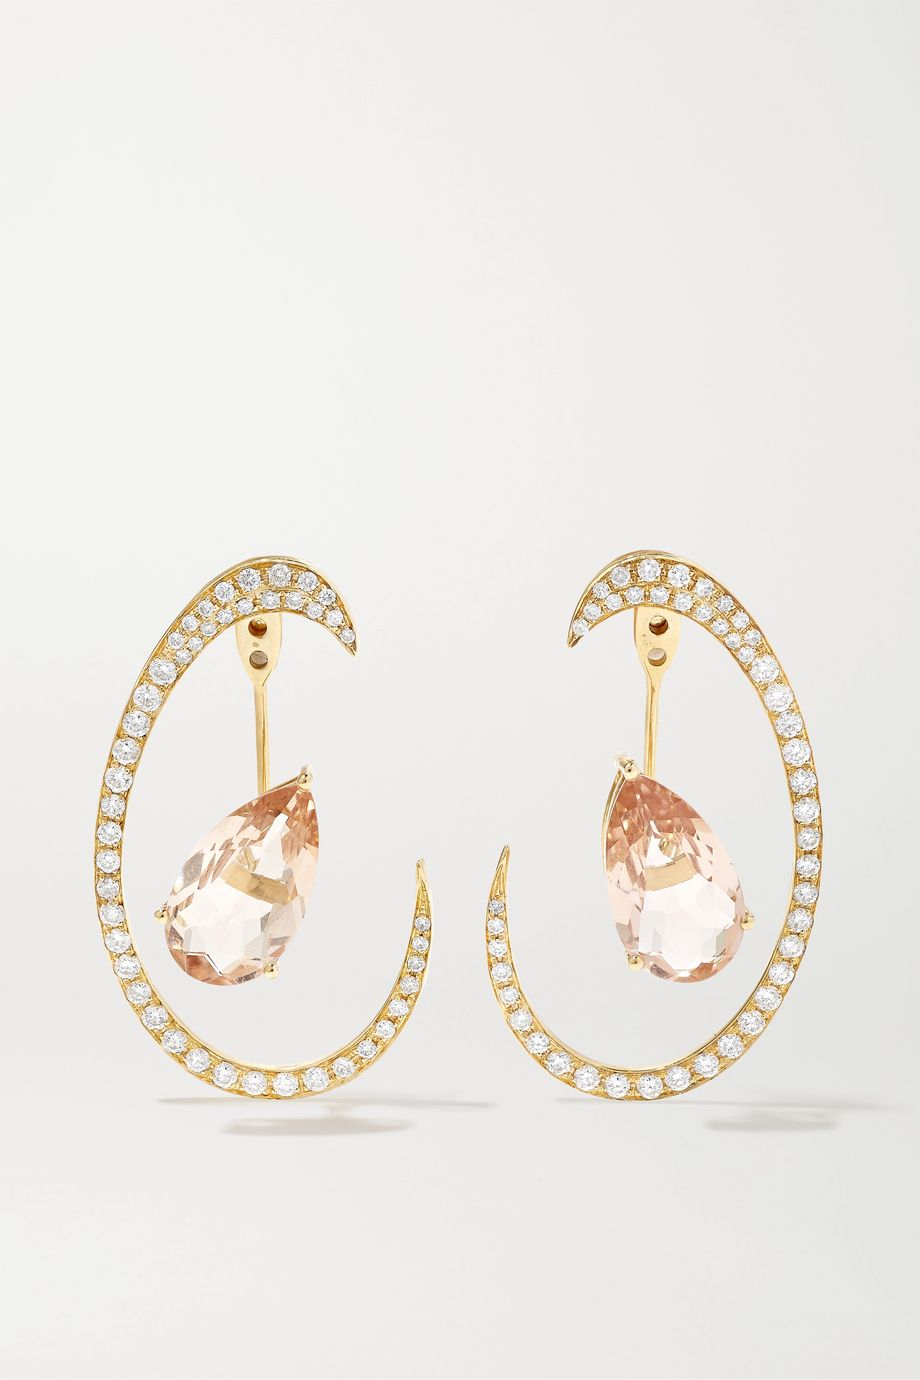 Anissa Kermiche Îles de Madagascar 18-karat gold, morganite and diamond earrings